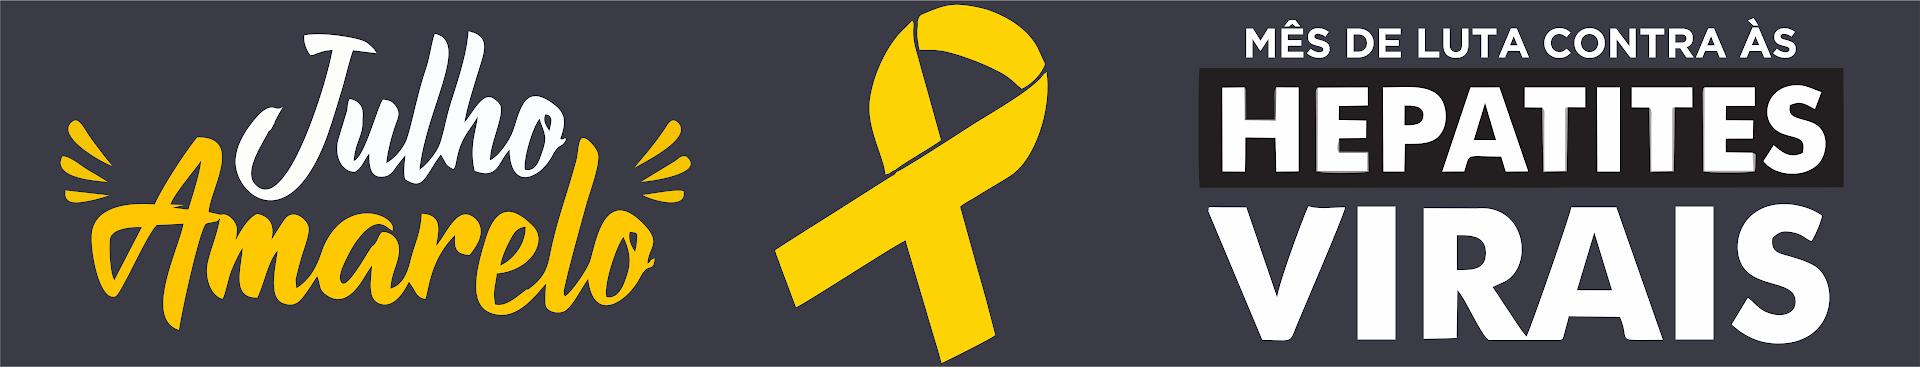 Julho Amarelo - Mês de luta contra às Hepatites Virais